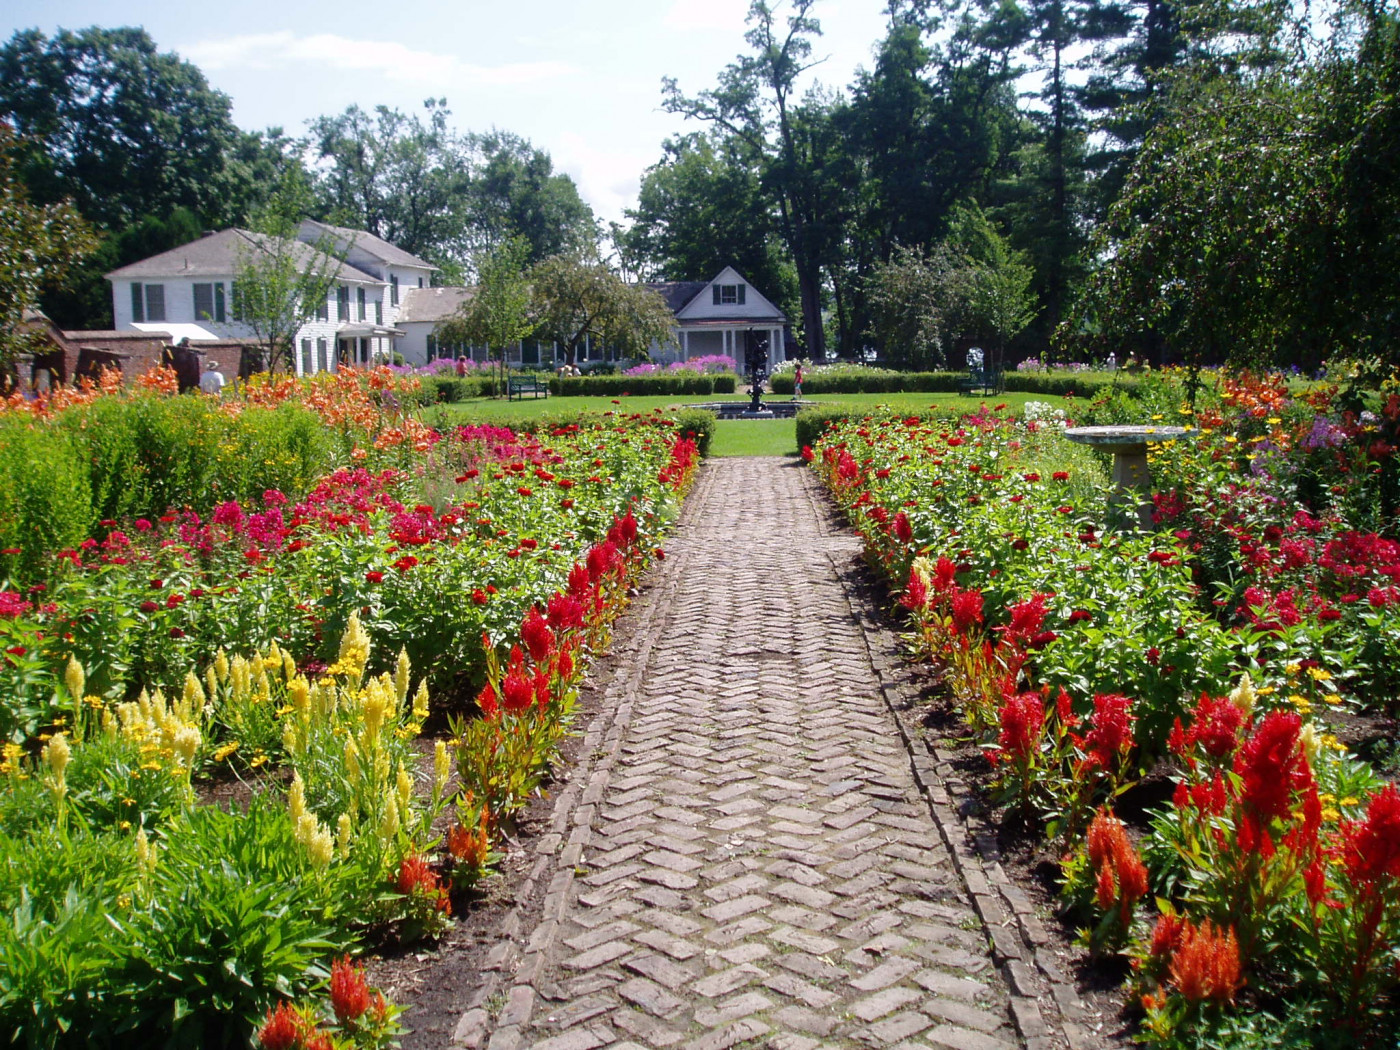 Fort Ticonderoga's 2021 Virtual Garden & Landscape Symposium